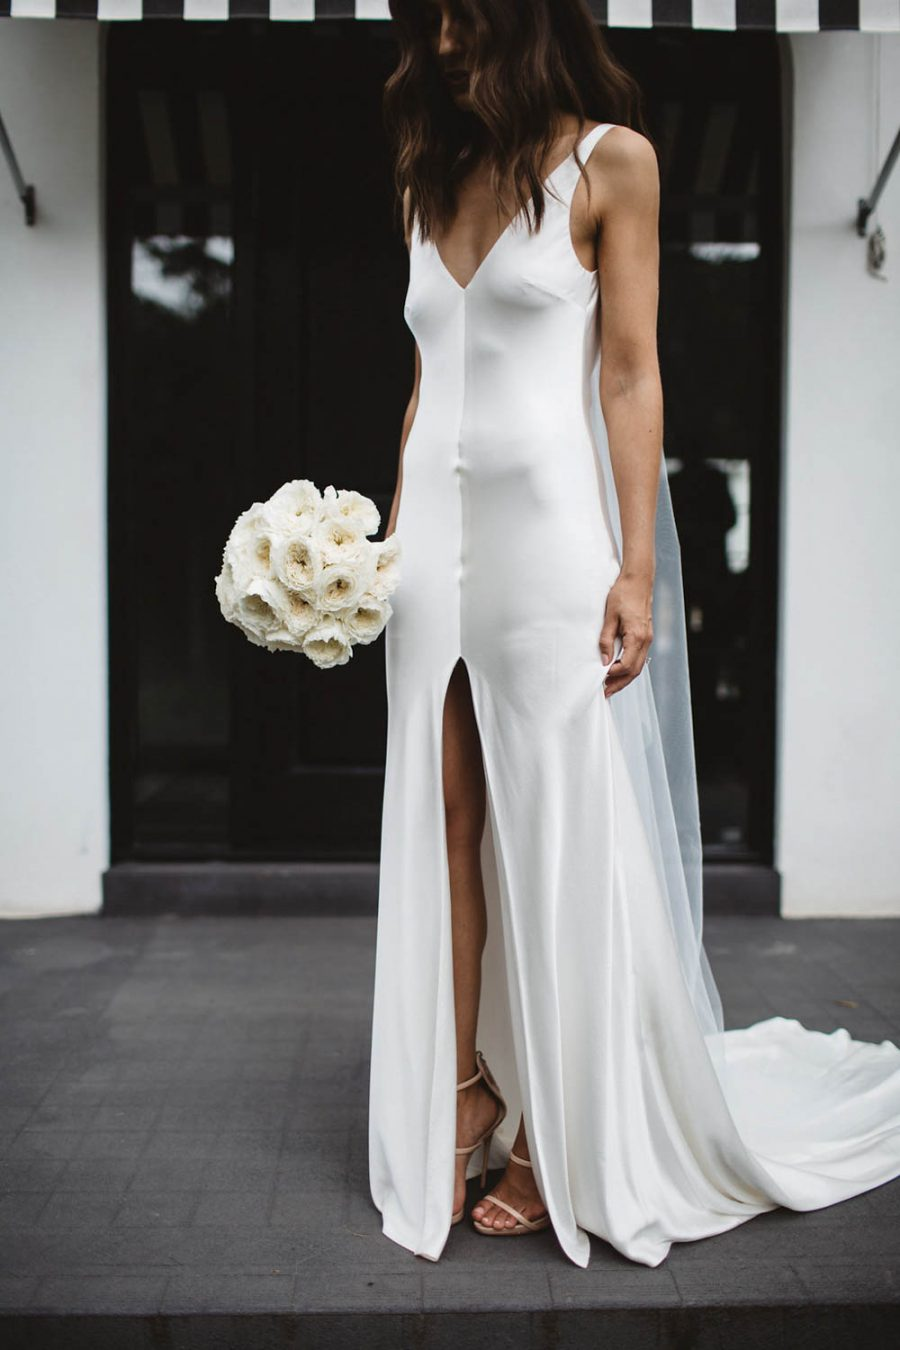 Bridle dress / Wedding Photography